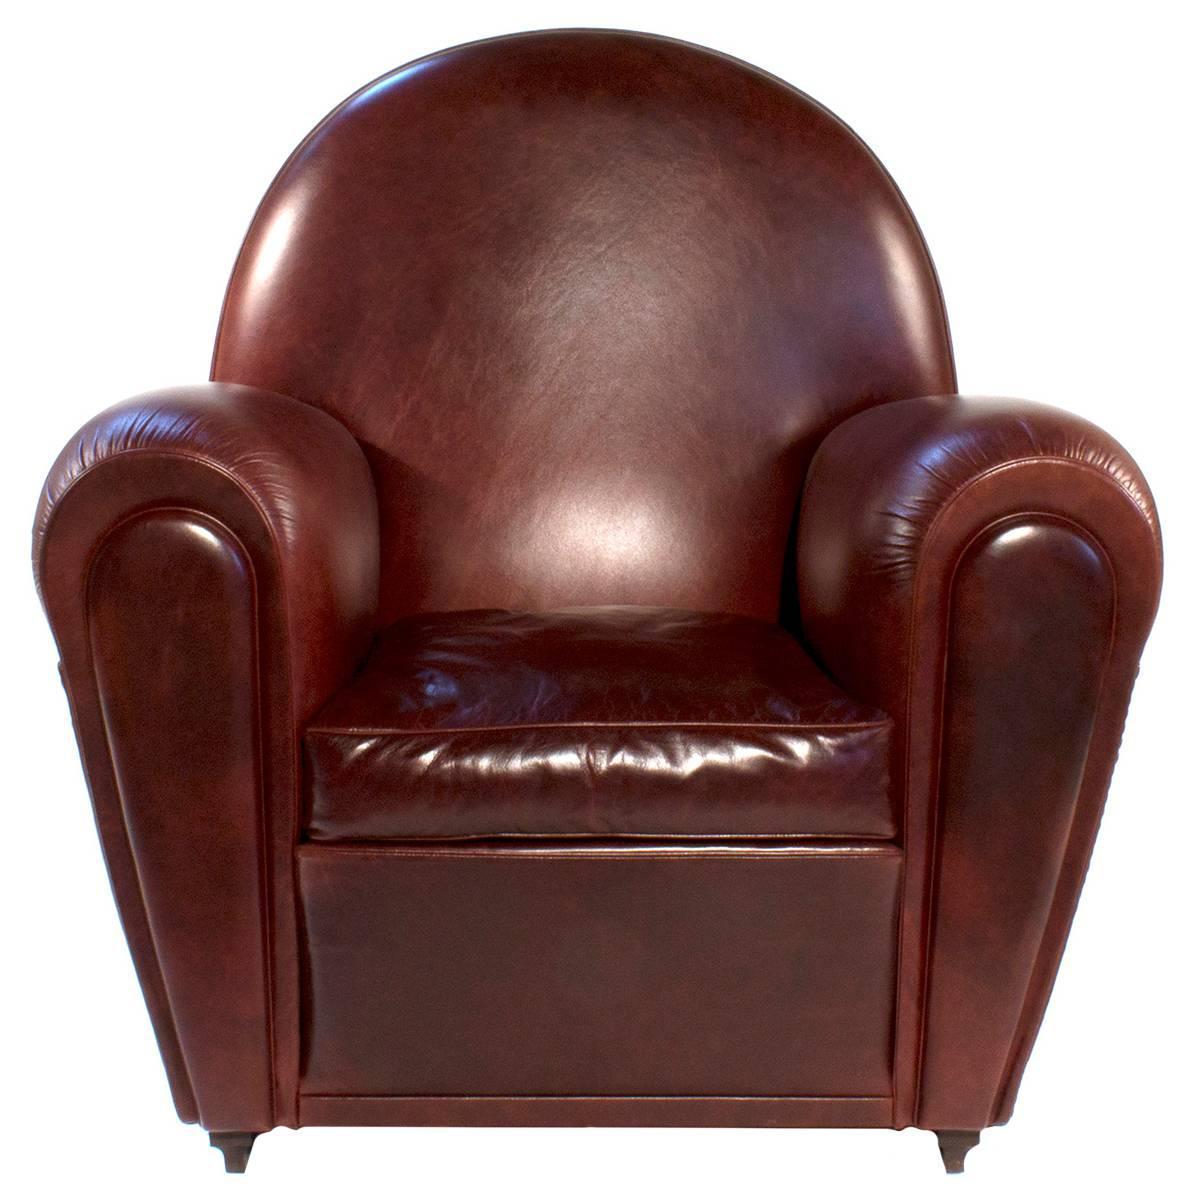 Vanity Fair Leather Lounge Armchair by Renzo Frau for Poltrona ...